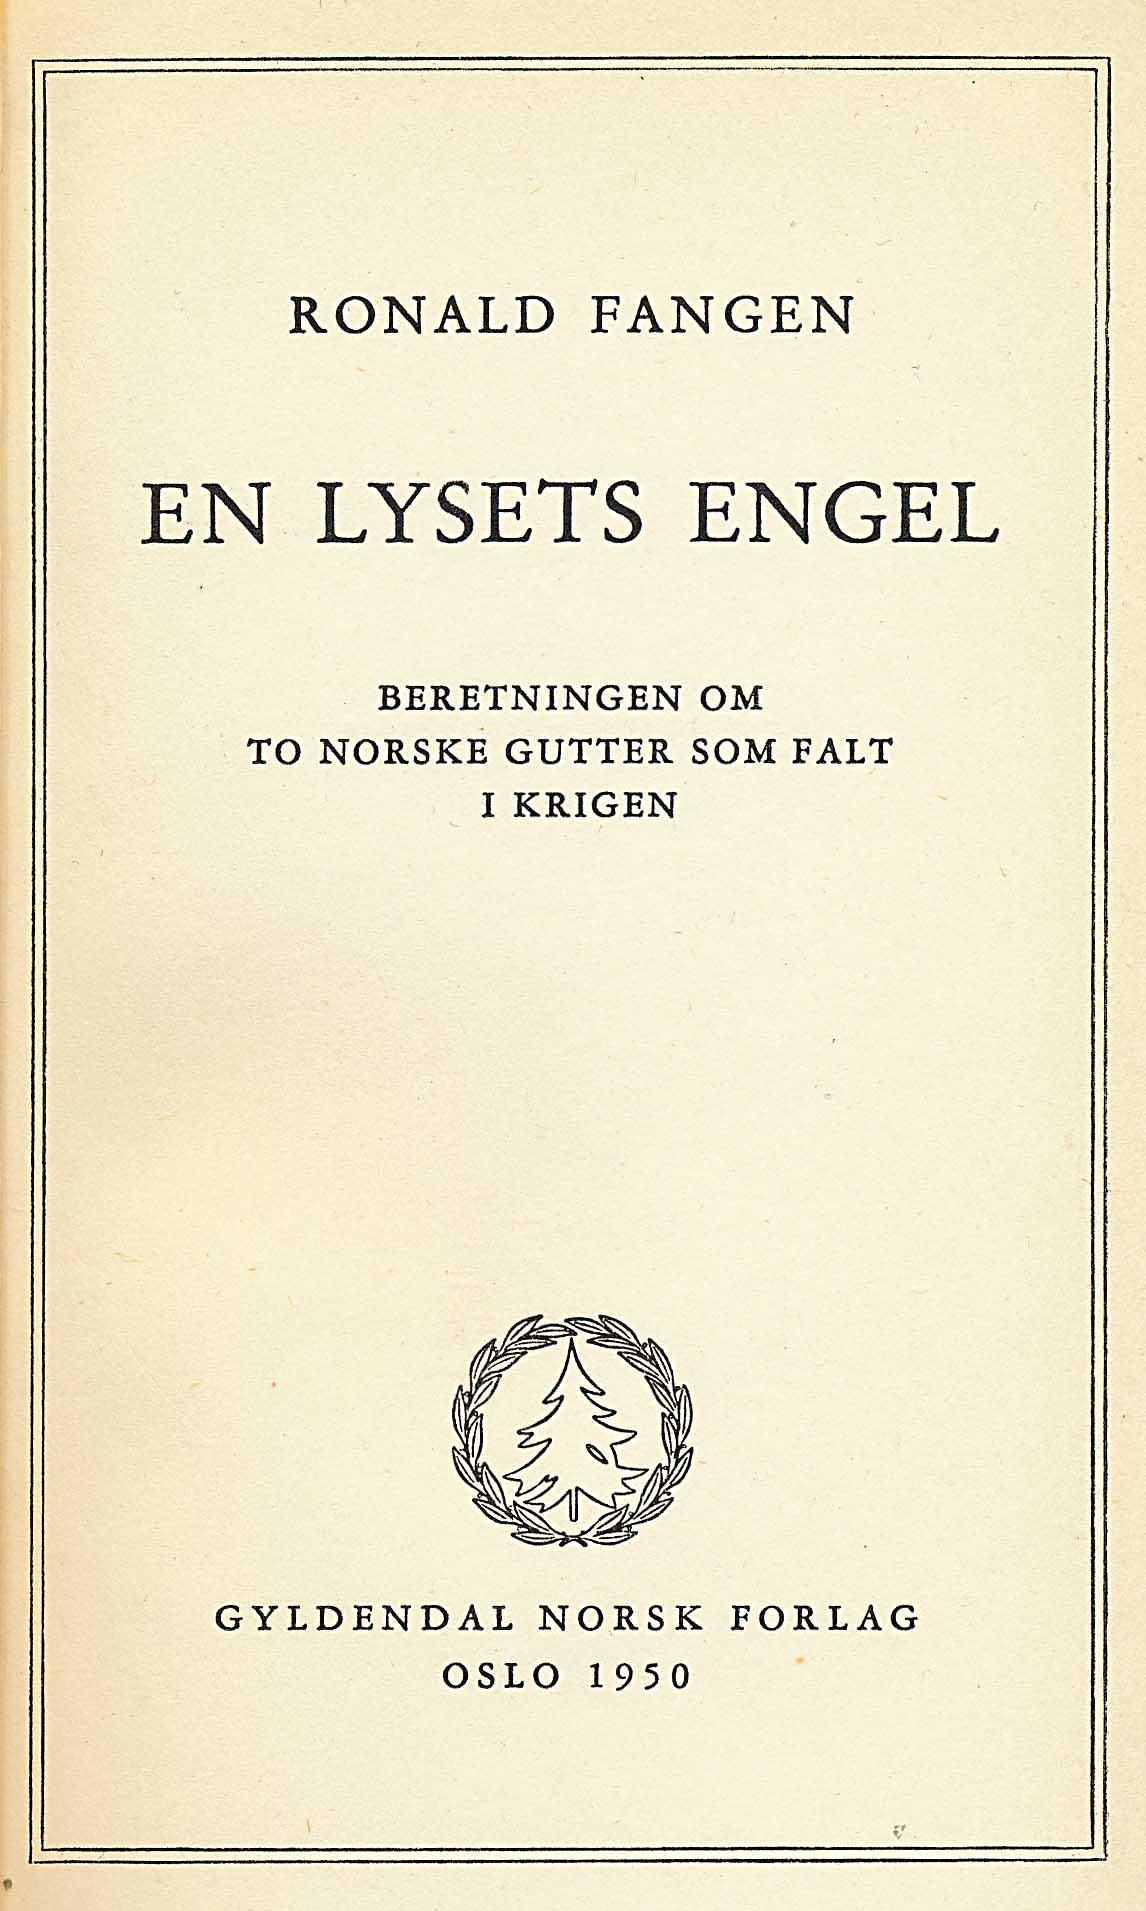 """En lysets engel - beretningen om to norske gutter som falt i krigen"" av Ronald Fangen"